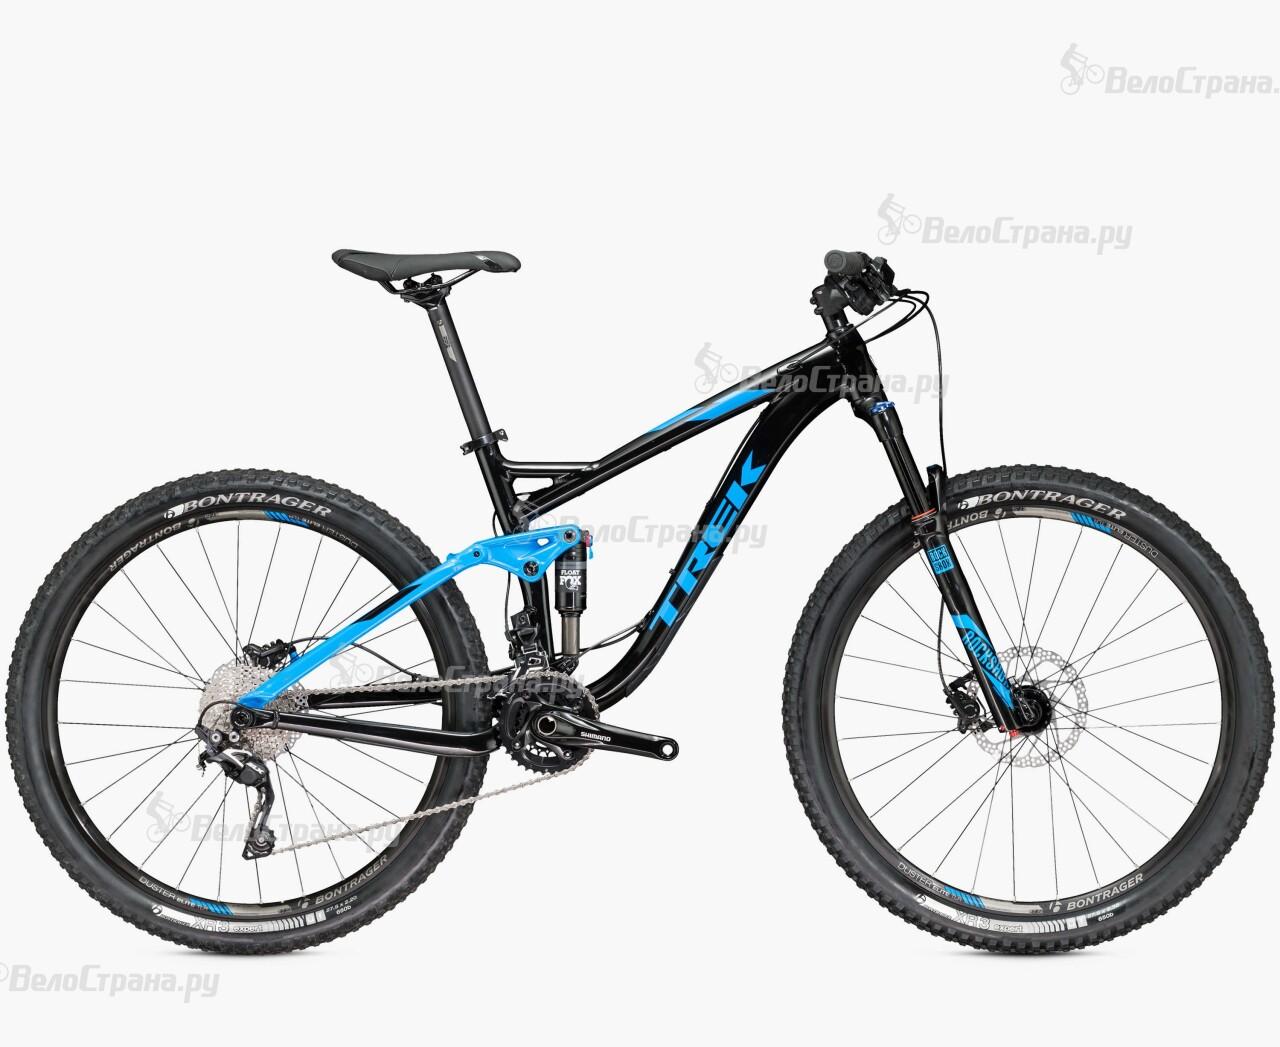 Велосипед Trek Fuel EX 7 27.5 (2016)